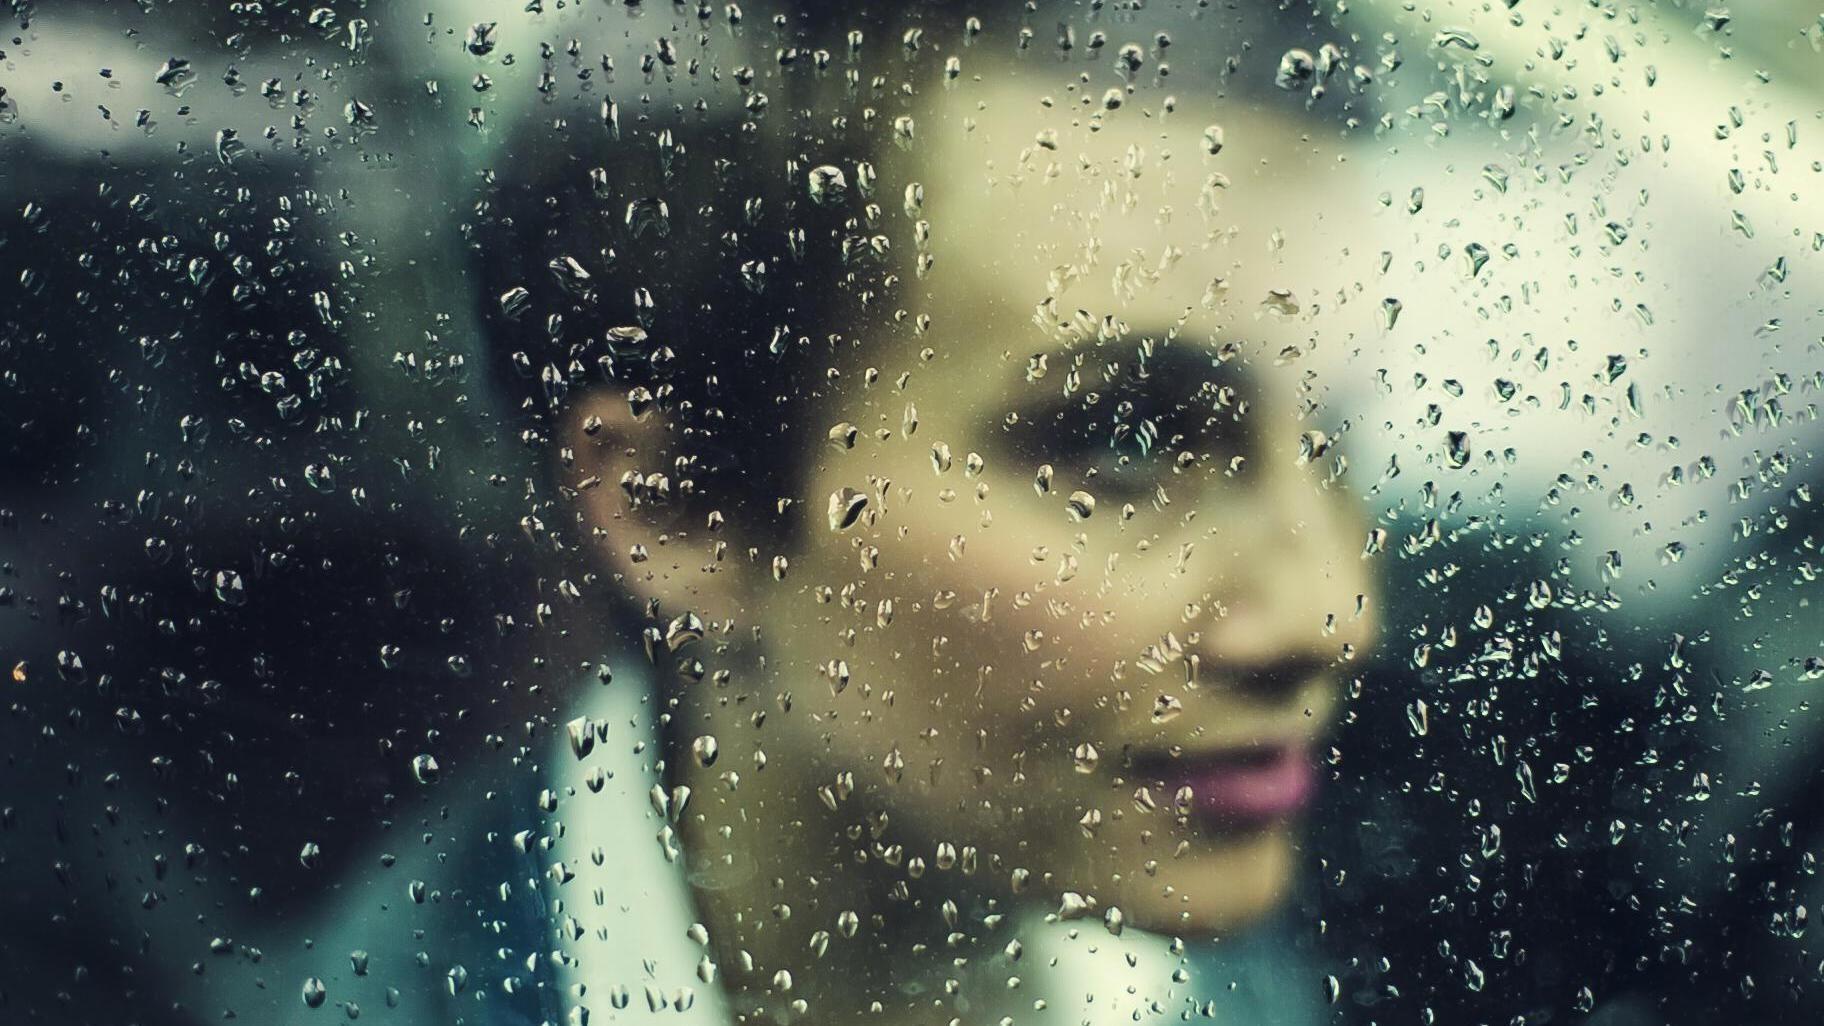 Beautiful Fall Landscape Wallpaper Free Picture Rain Window Person Woman Beauty Face